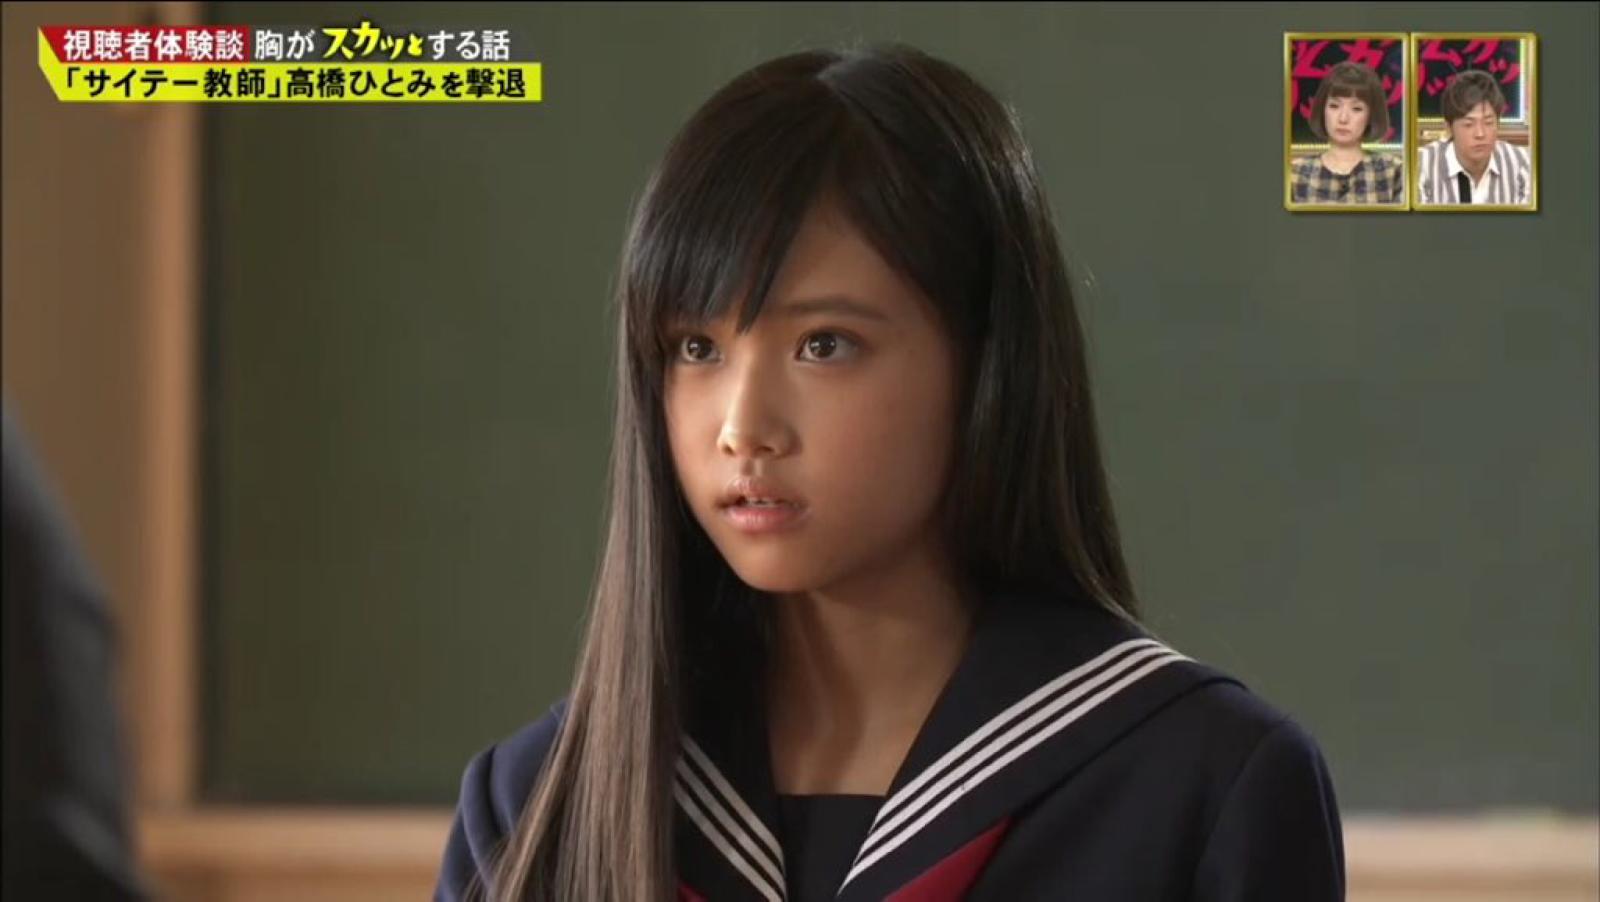 【JS】女子小学生 高学年画像スレPart32【JS】 [無断転載禁止]©bbspink.comYouTube動画>10本 ->画像>615枚